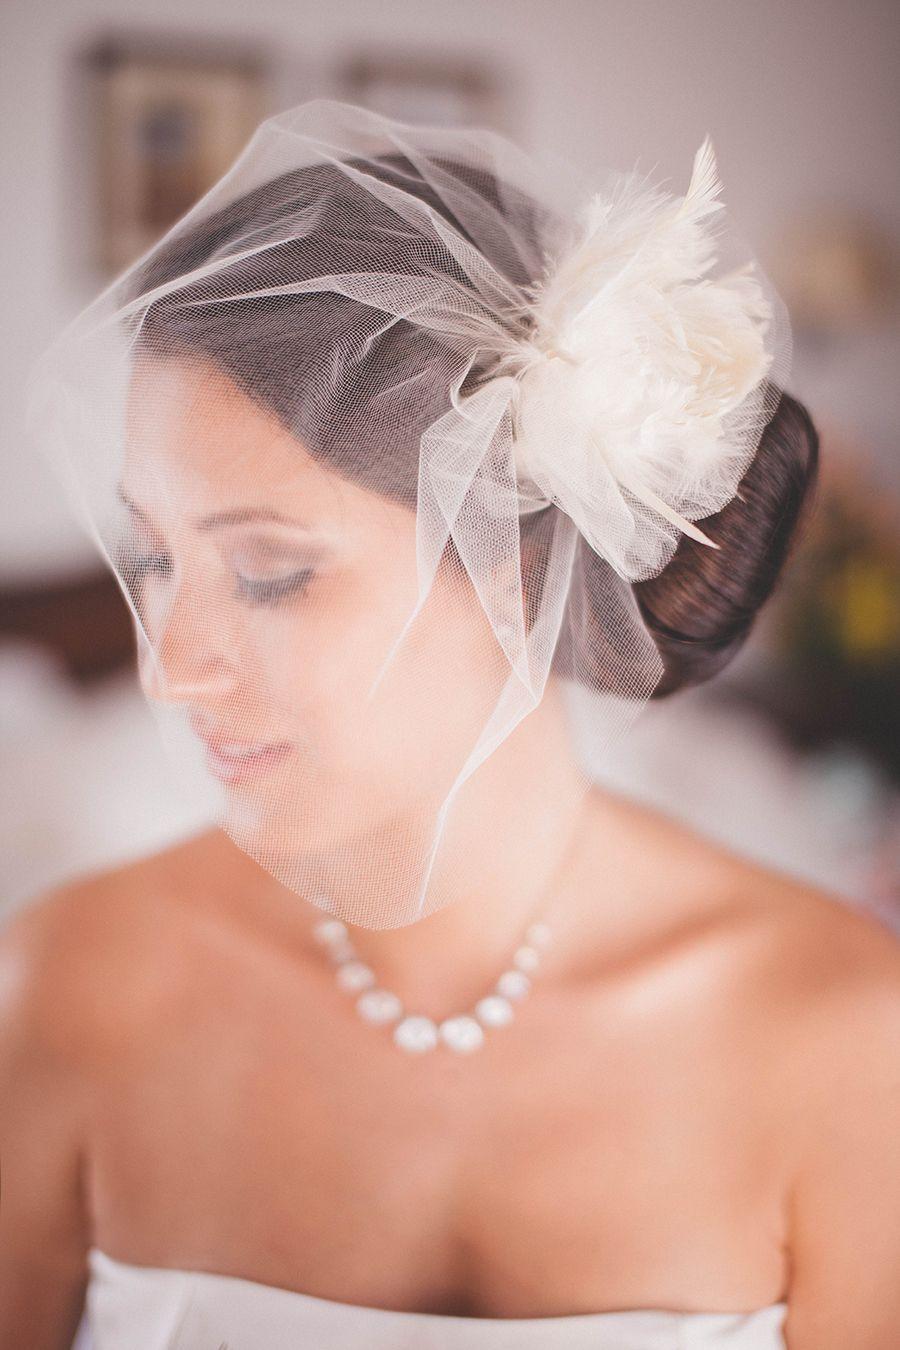 Diana-and-Jonas beautiful portrait #love #bride #portrait #femaleportrait #naturallight #vintage #bridevintage